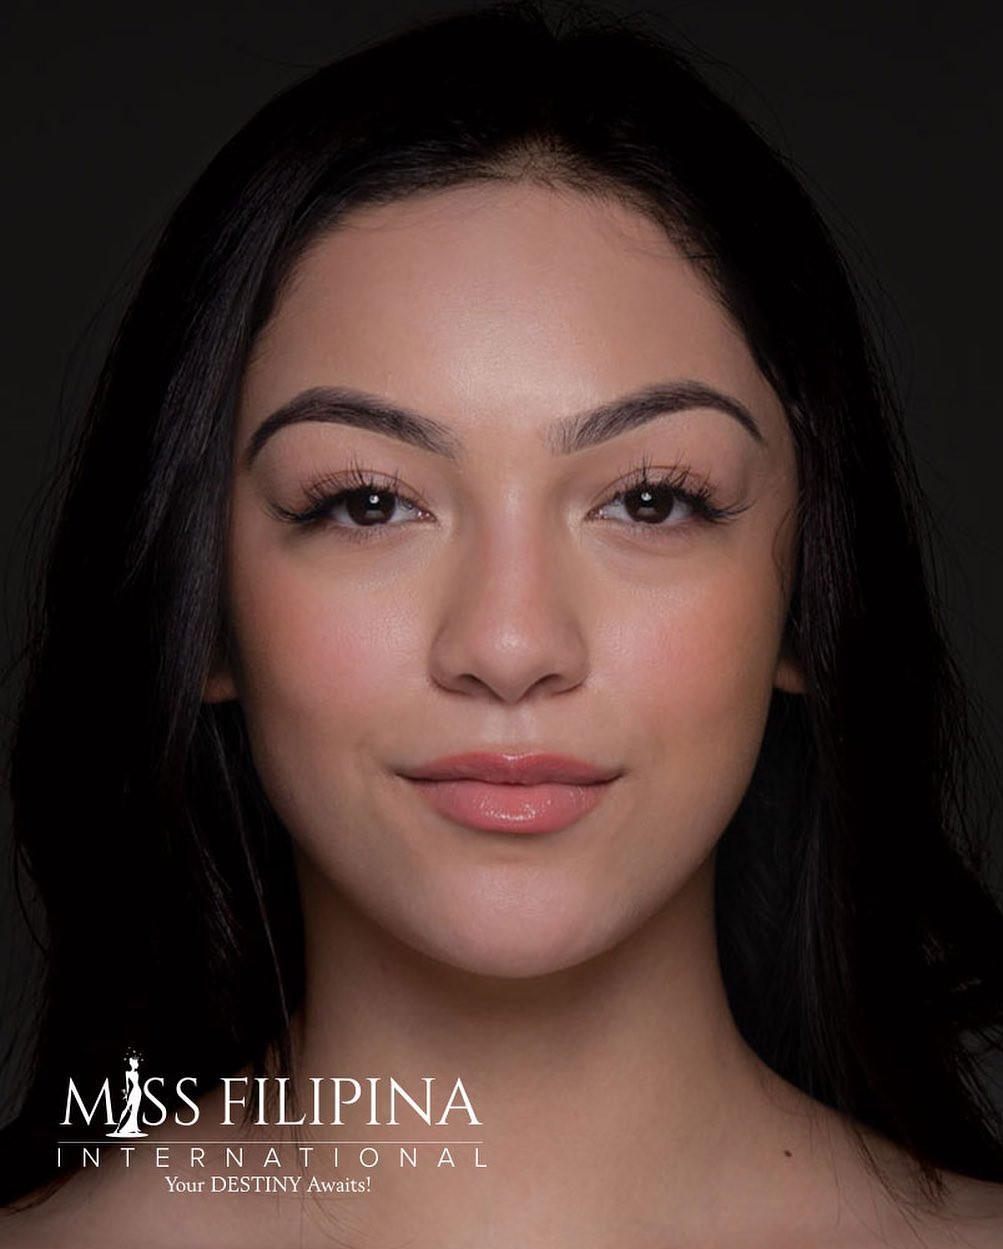 candidatas a miss filipina international 2021. final: 31 july. - Página 2 A5fGAx